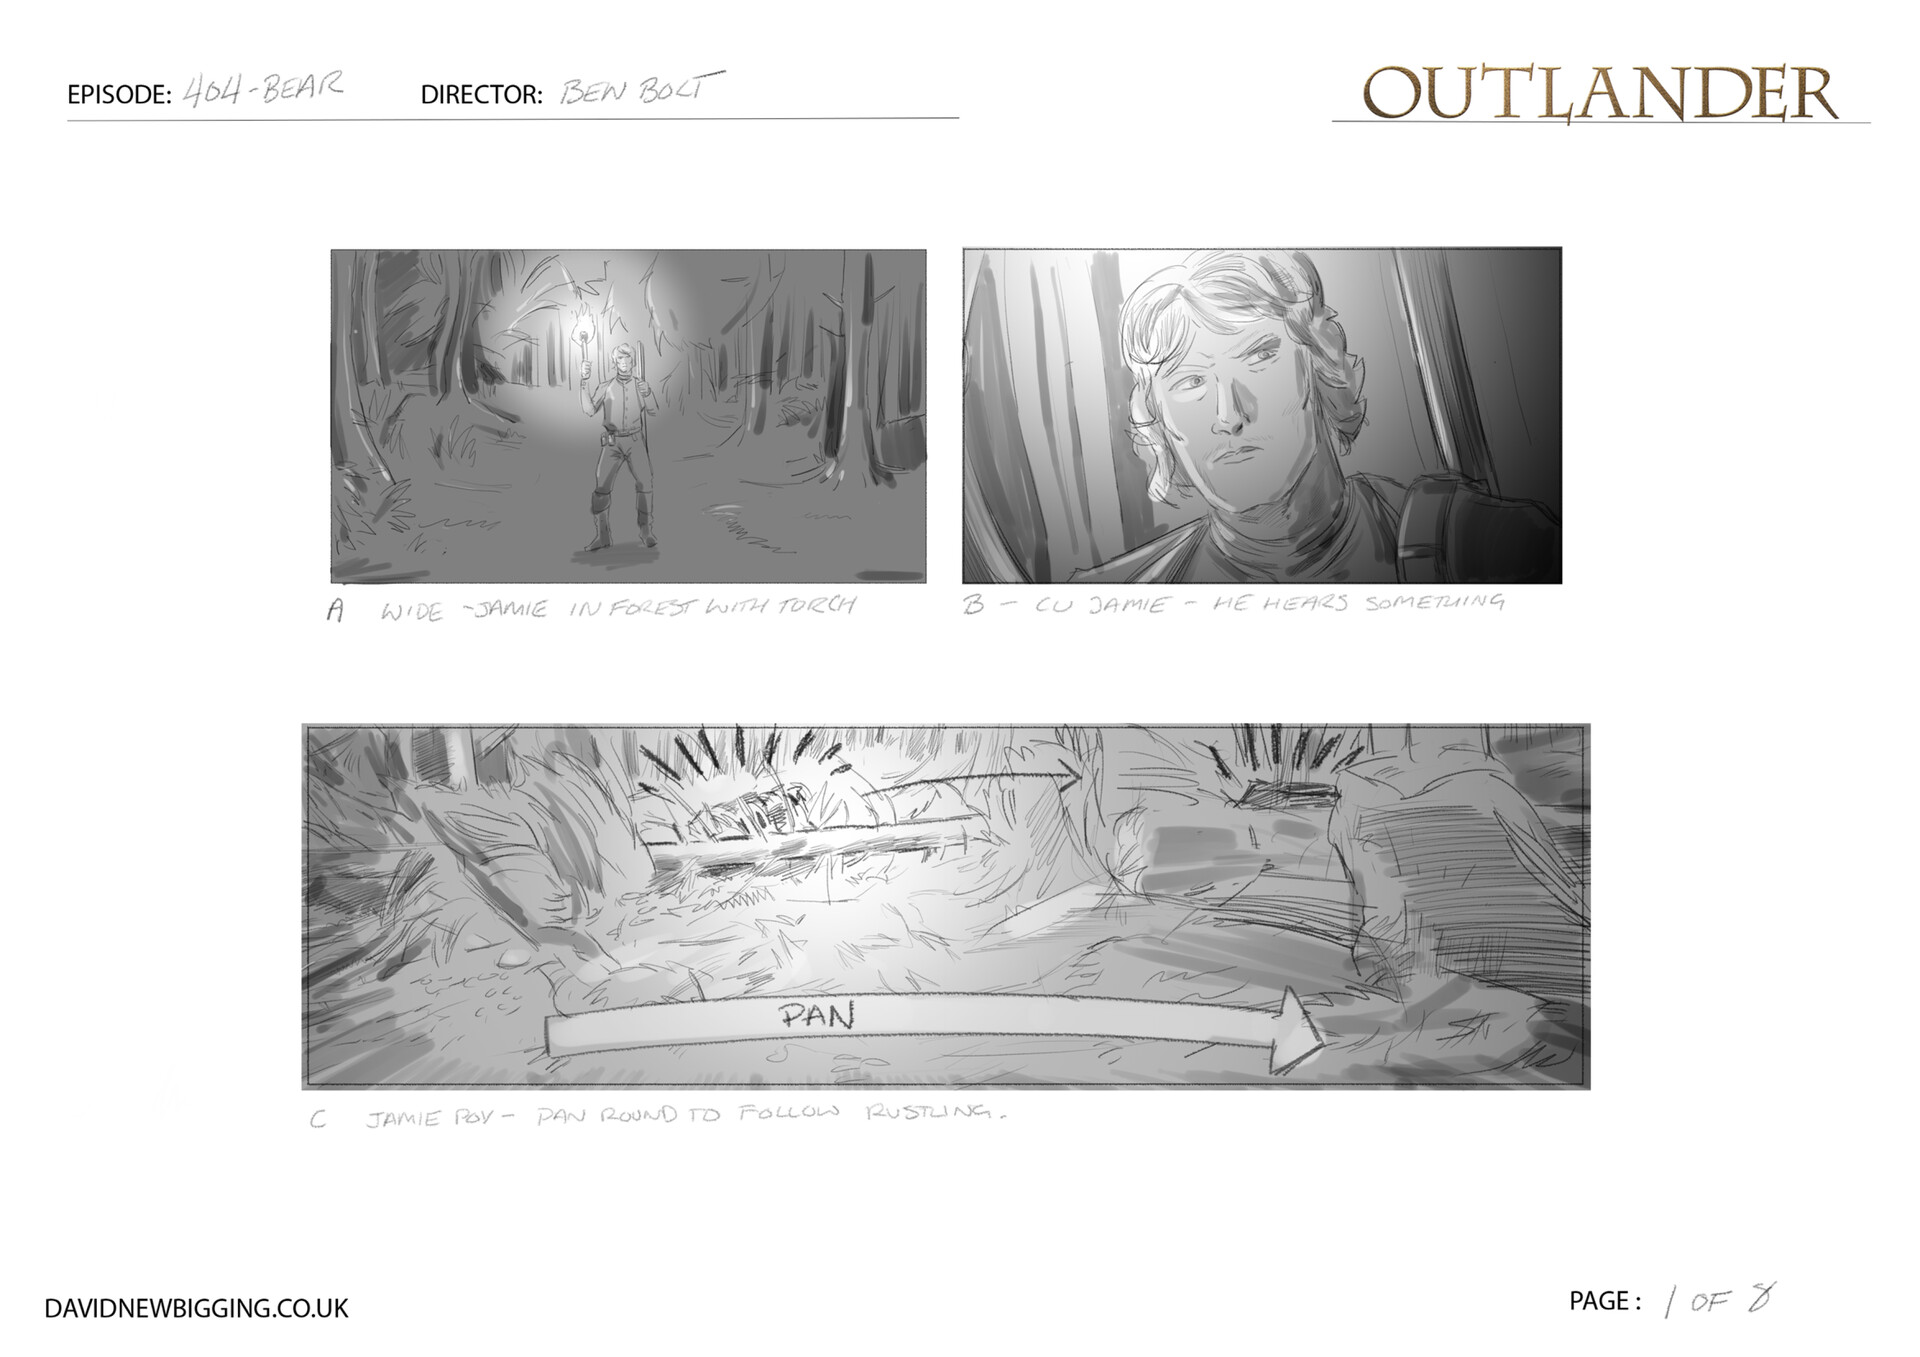 David newbigging outlander 404 bear sequence storyboards 1